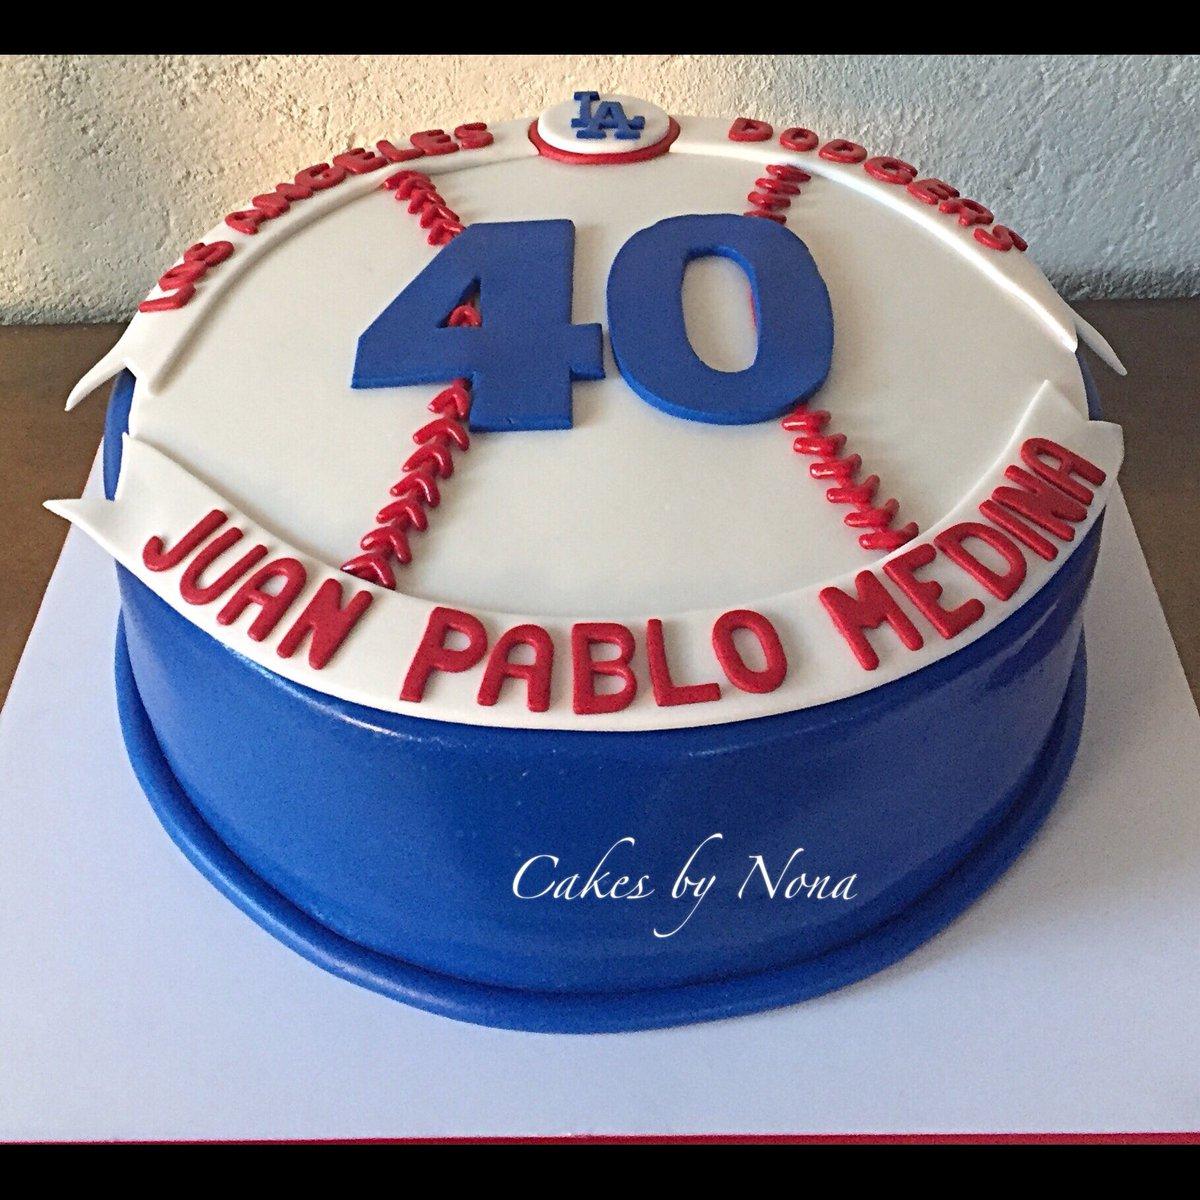 Remarkable Cakesbynona On Twitter Dodgers Baseball Fan Cake Dodgers Funny Birthday Cards Online Benoljebrpdamsfinfo